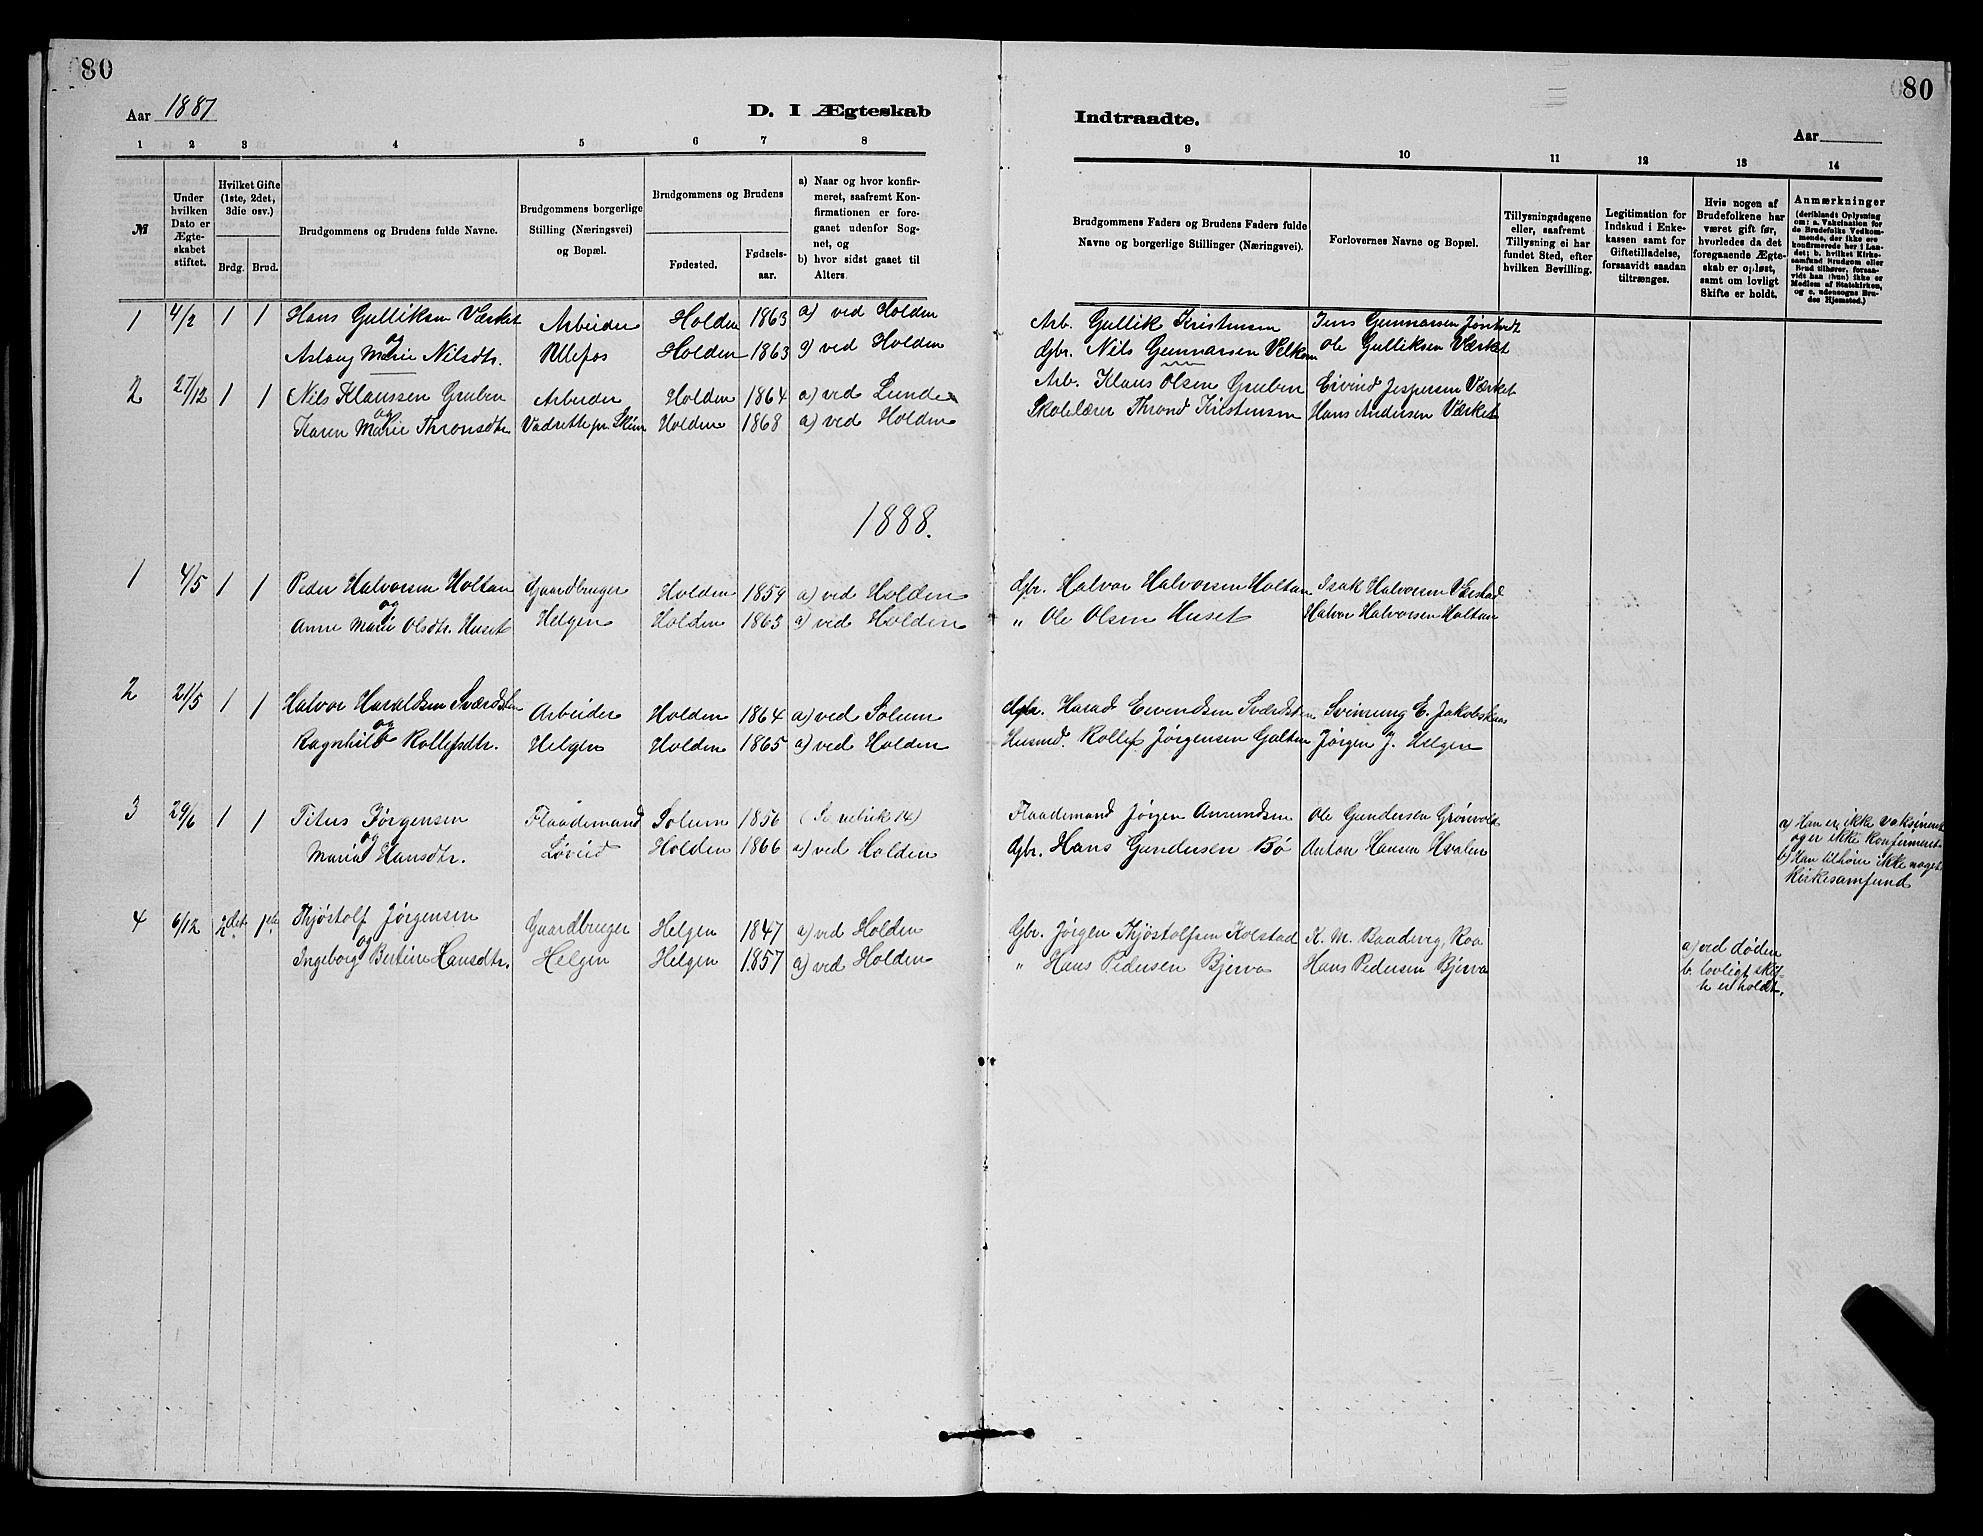 SAKO, Holla kirkebøker, G/Gb/L0001: Klokkerbok nr. II 1, 1882-1897, s. 80